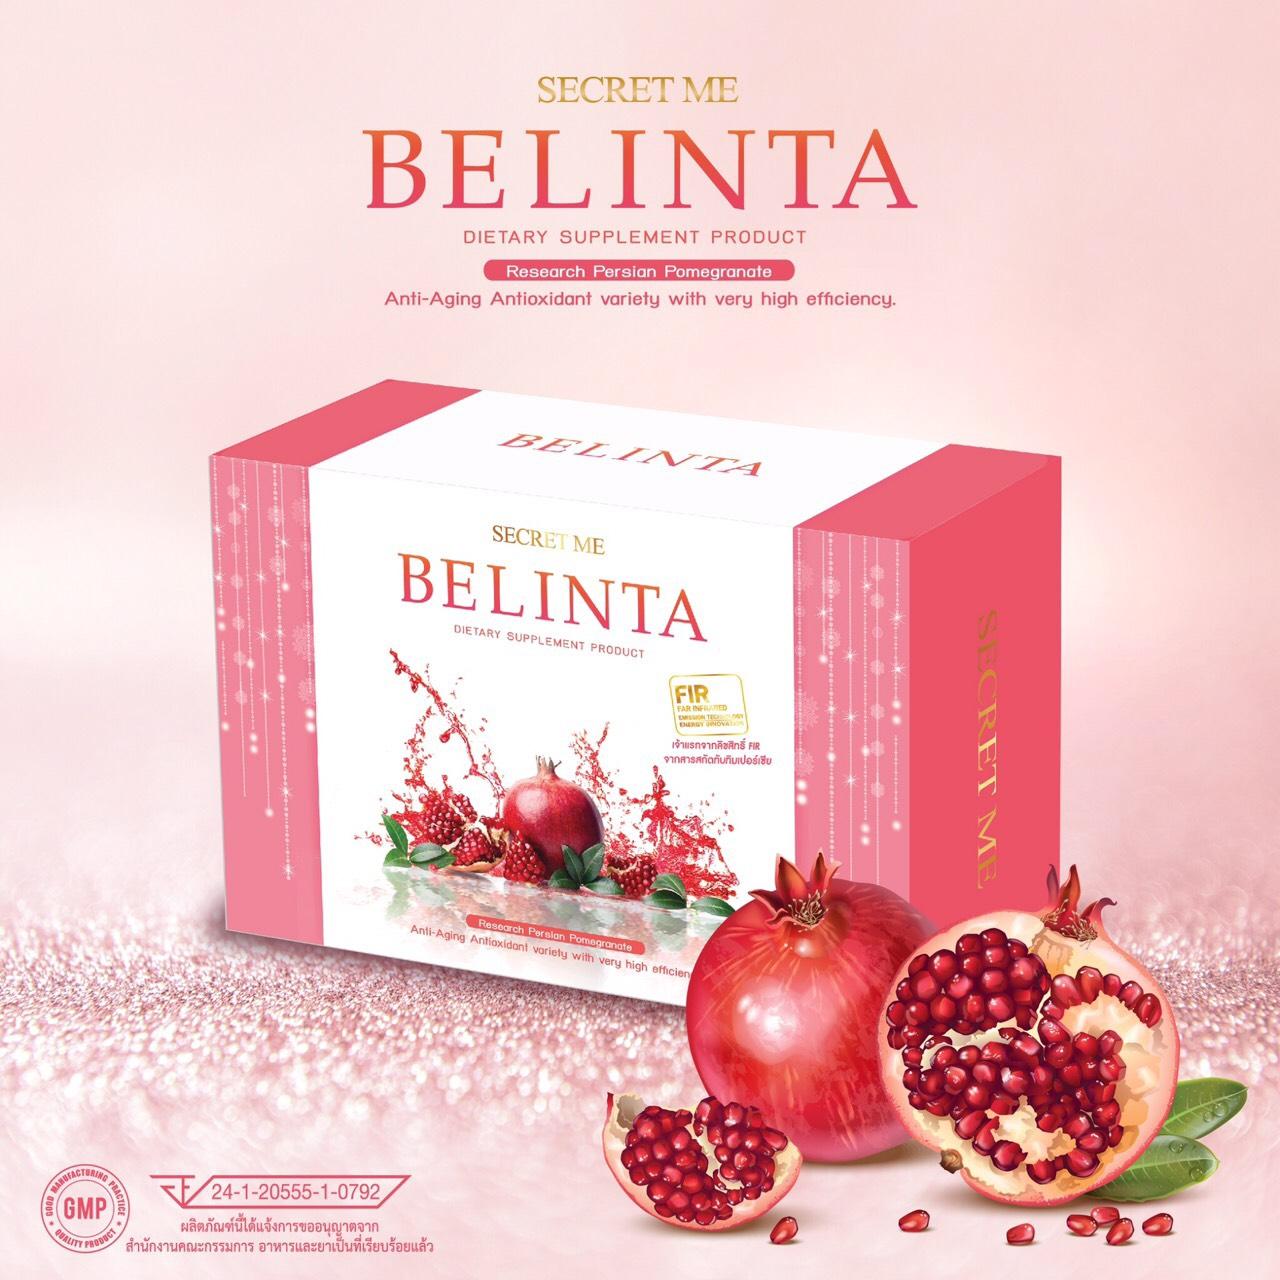 BELINTA by secret me เบลินต้า อาหารเสริมบำรุงผิว ของแท้ ราคาถูก